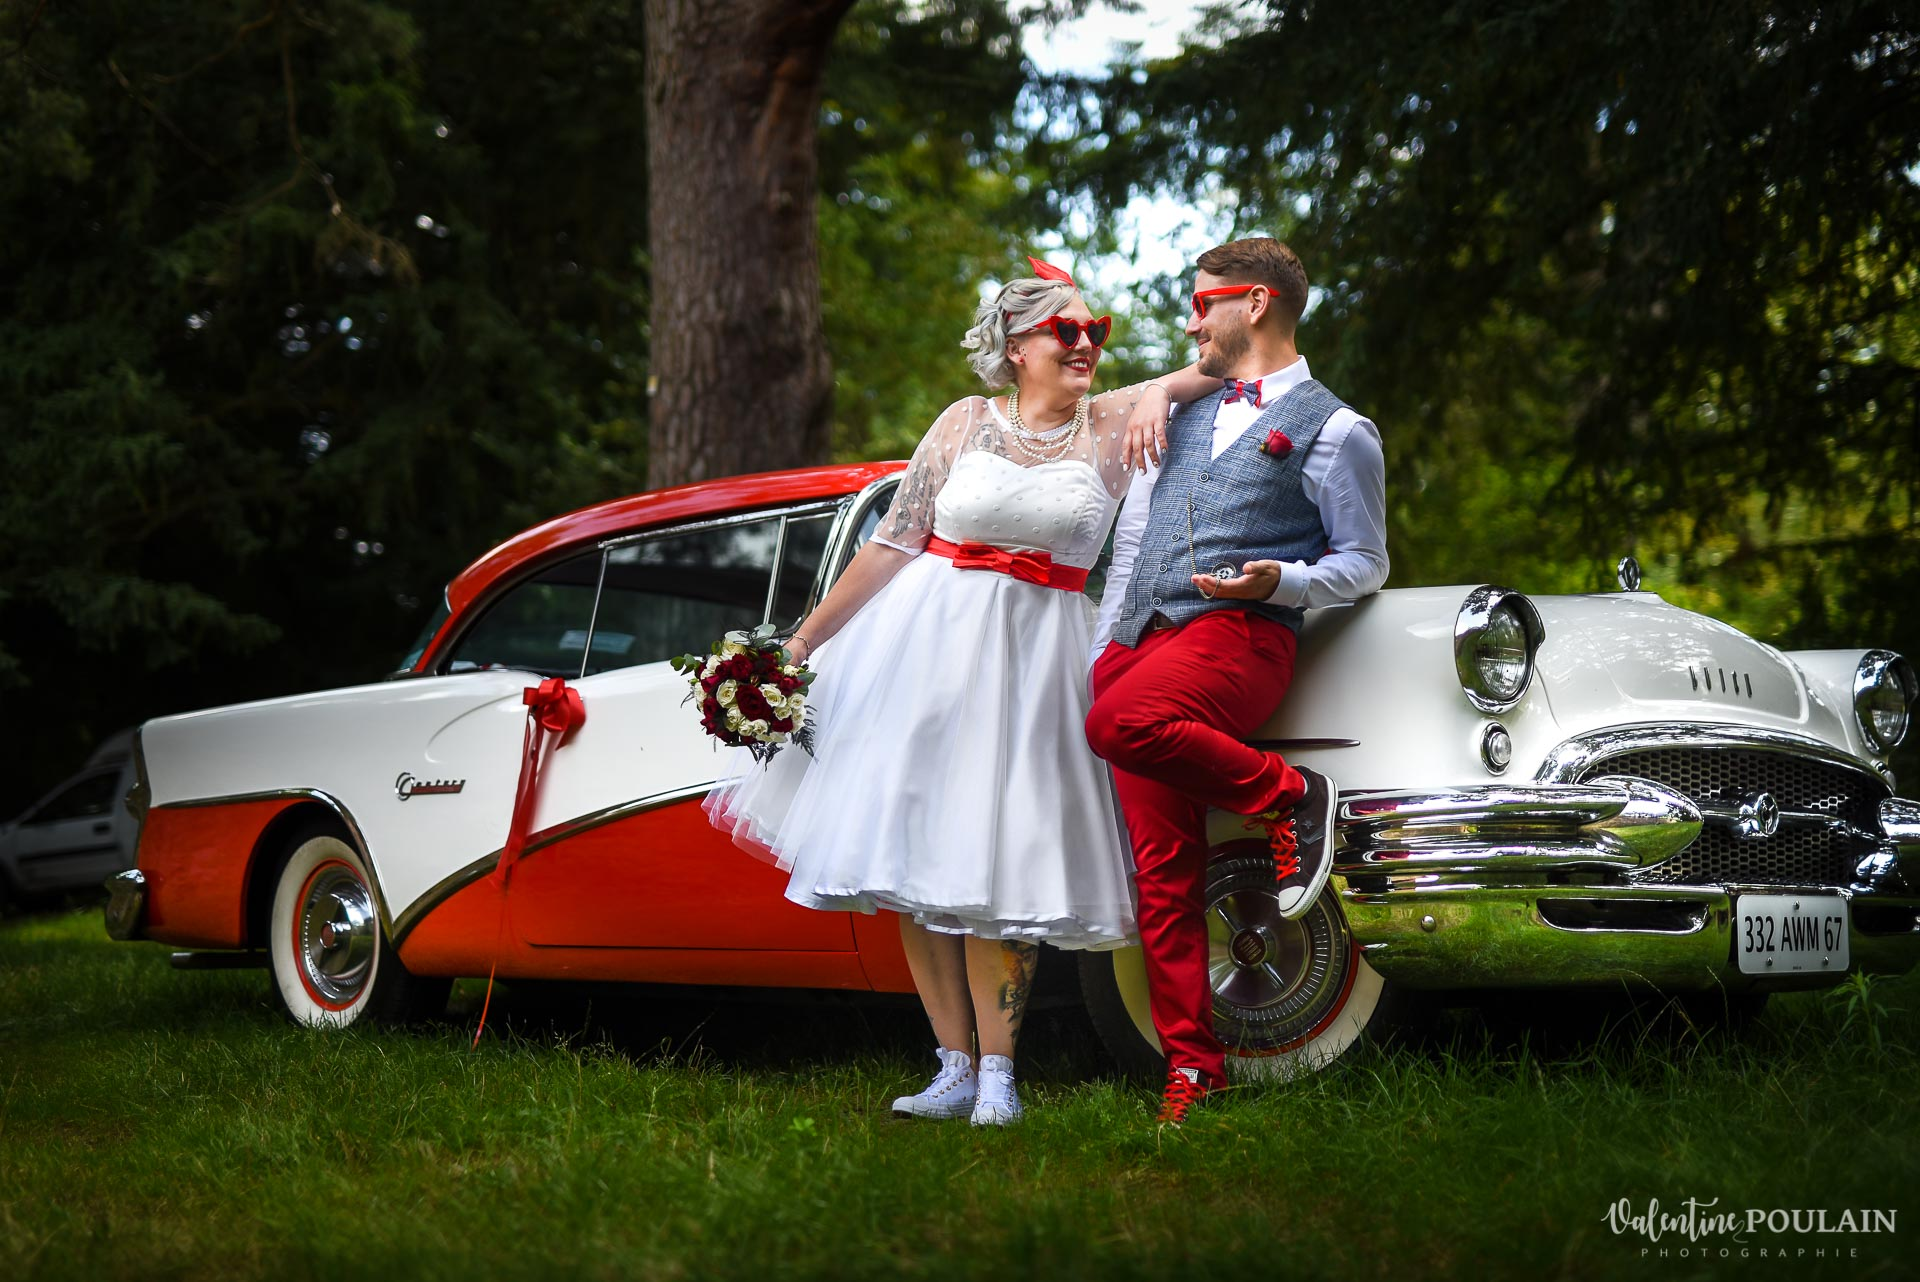 Mariage vintage rockabilly - Valentine Poulain - couple regard voiture